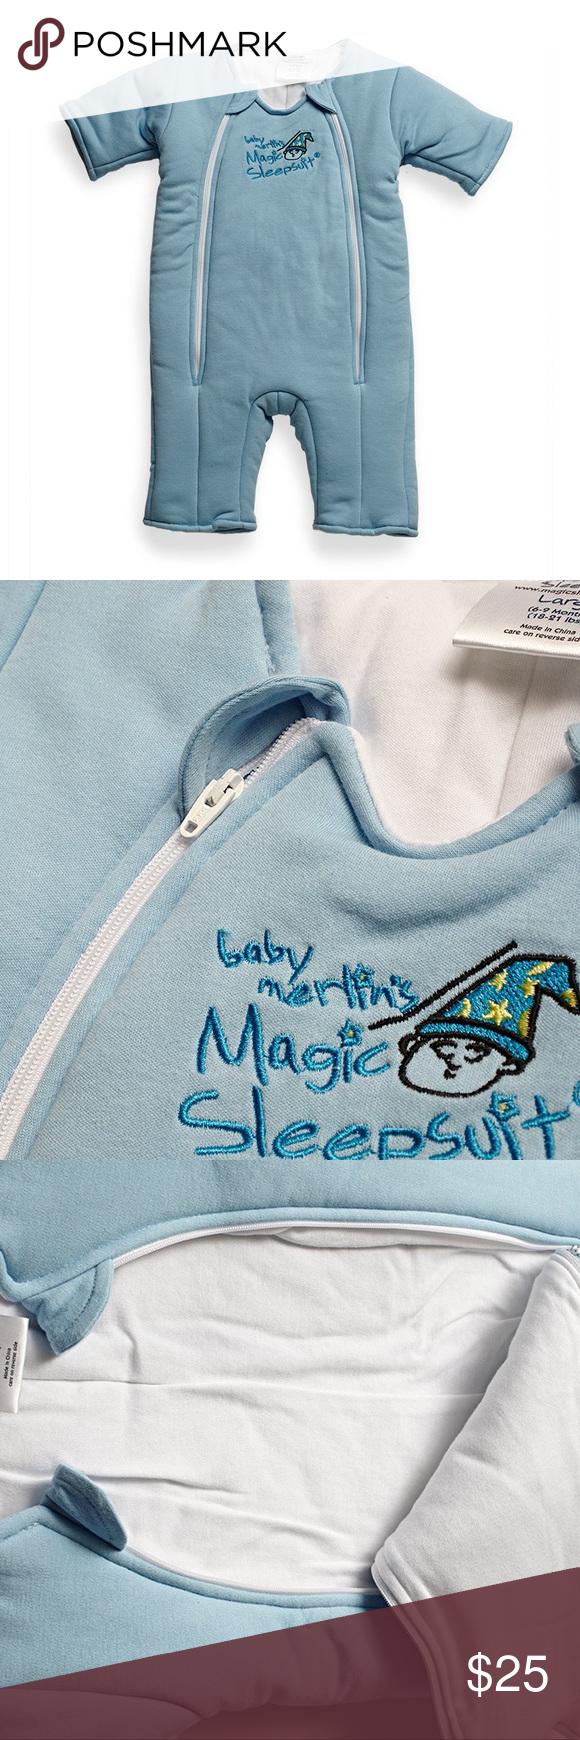 Baby Merlin's Magic Sleep Suit Features & details The ...